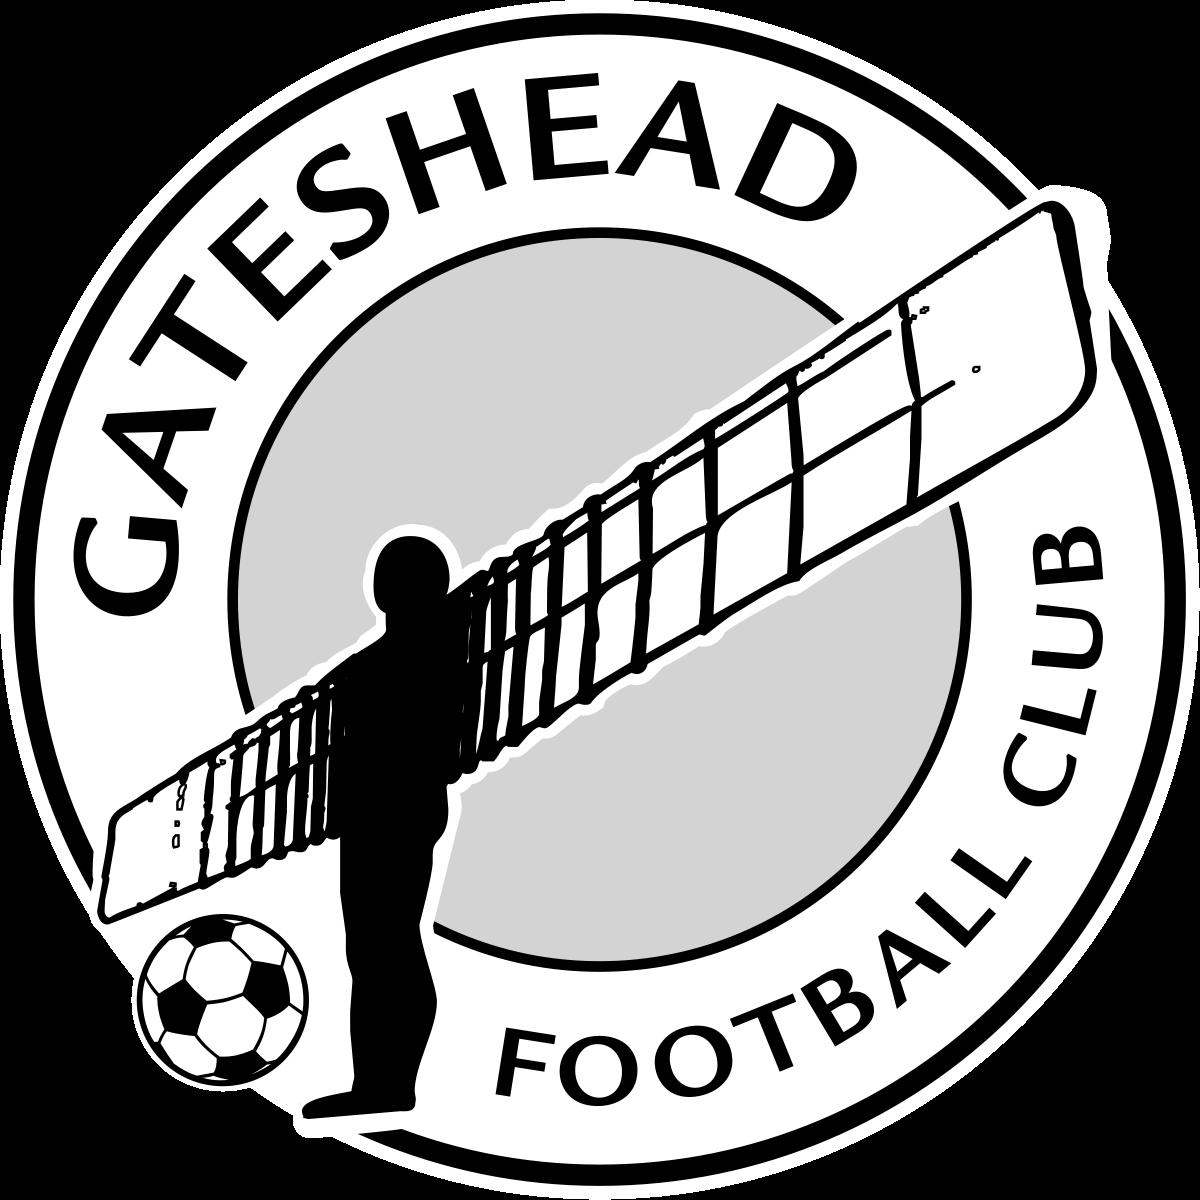 Gateshead crest